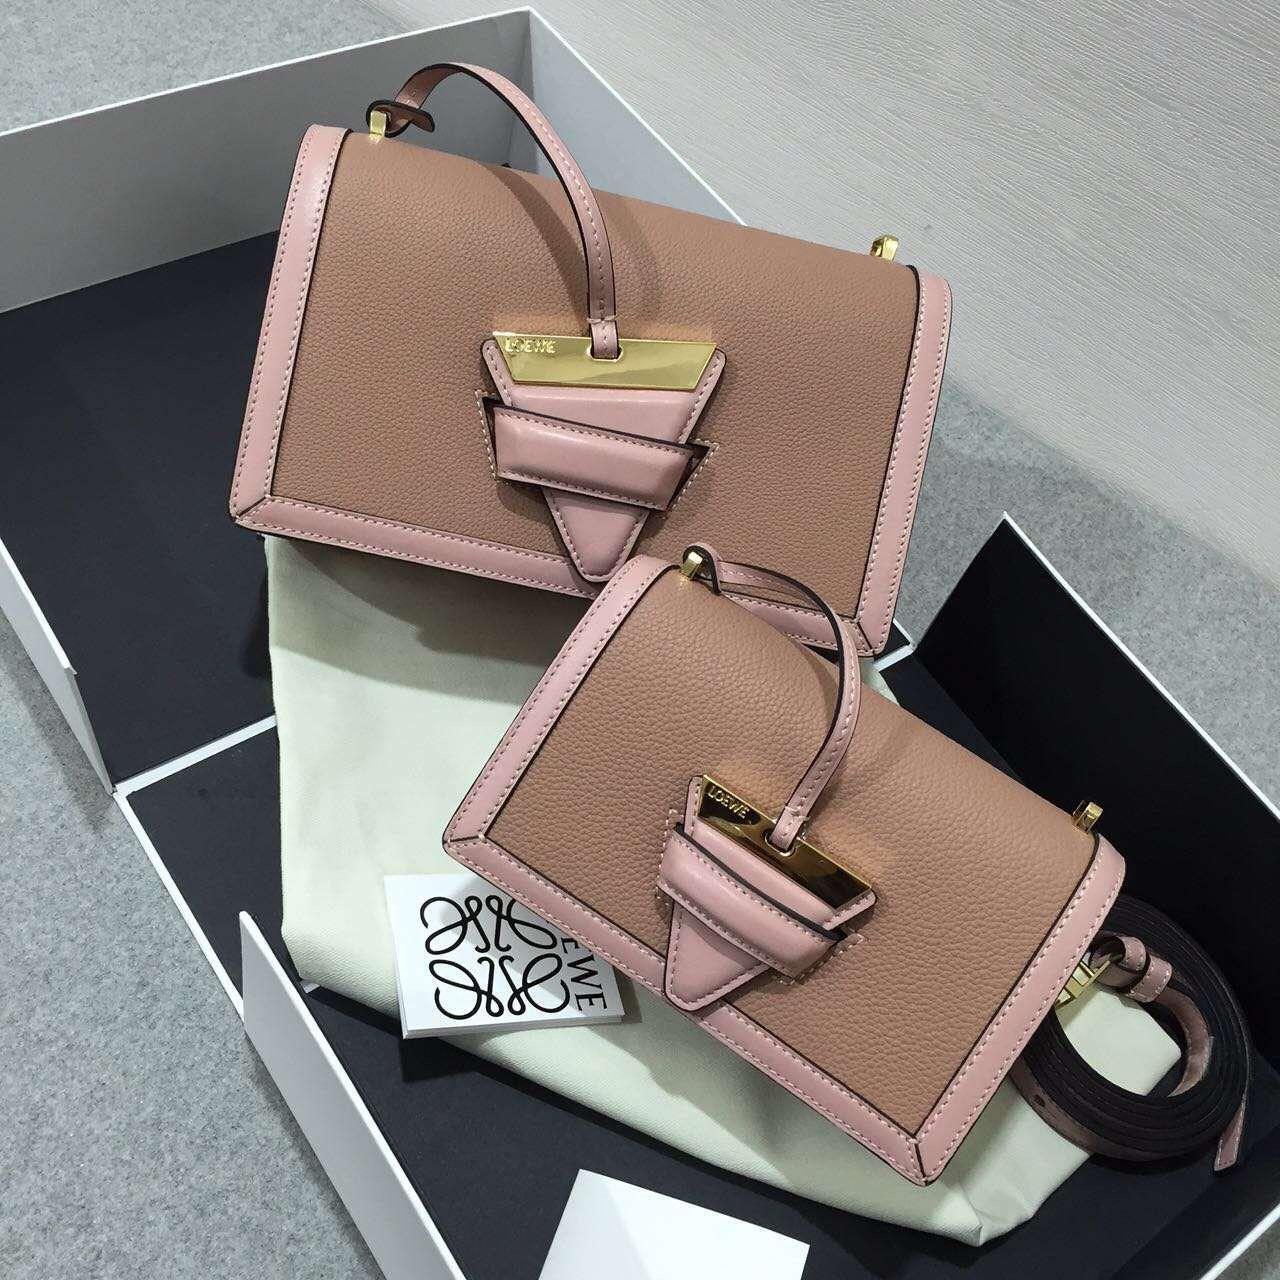 Loewe羅意威 巴塞羅那三角形包 Barcelona Bag blush